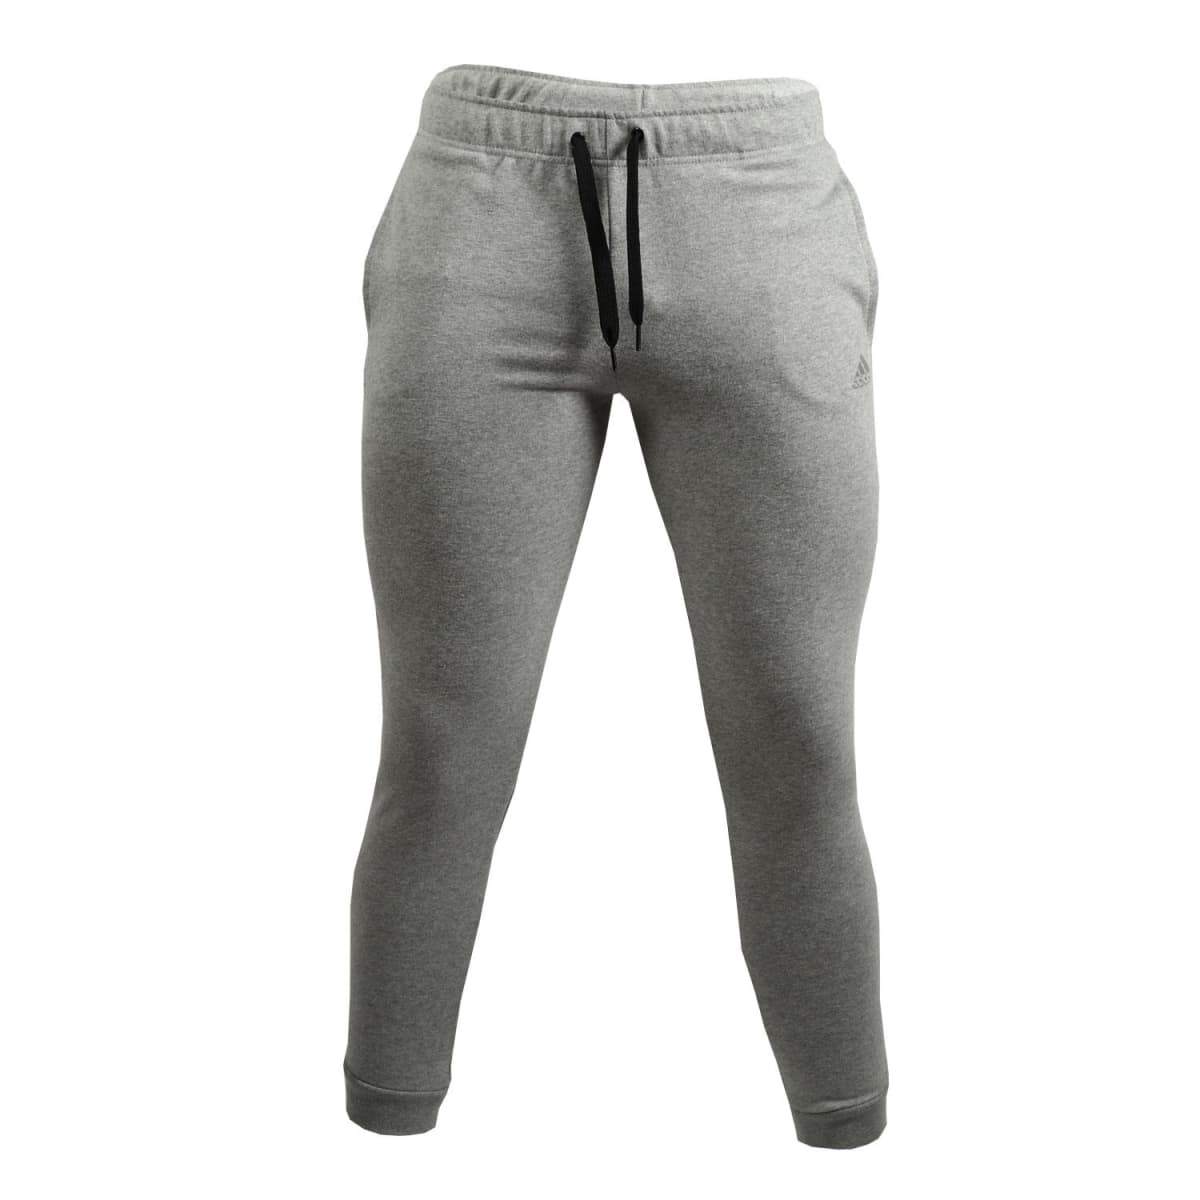 7119572984cec Product Image. Adidas Women's Heather SweatPant